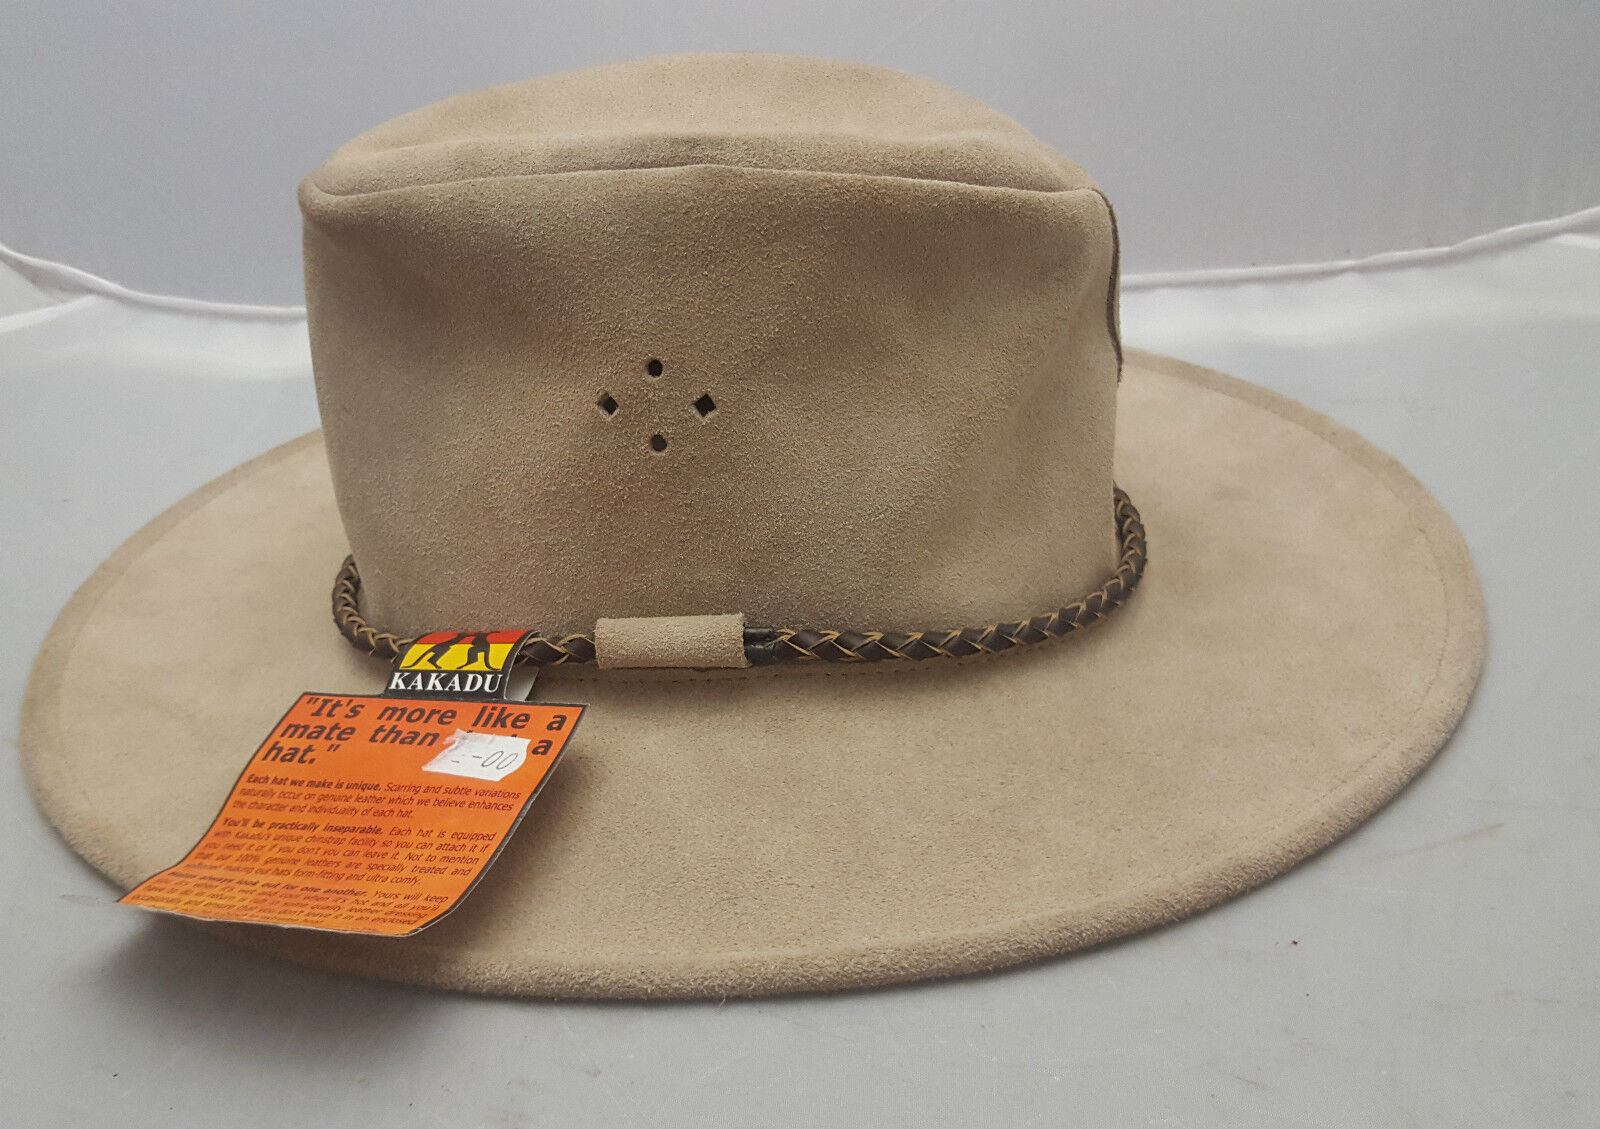 Kakadu Queenslander Suede Leather Hat Beige Size  Small (55cm) NEW  discount sales